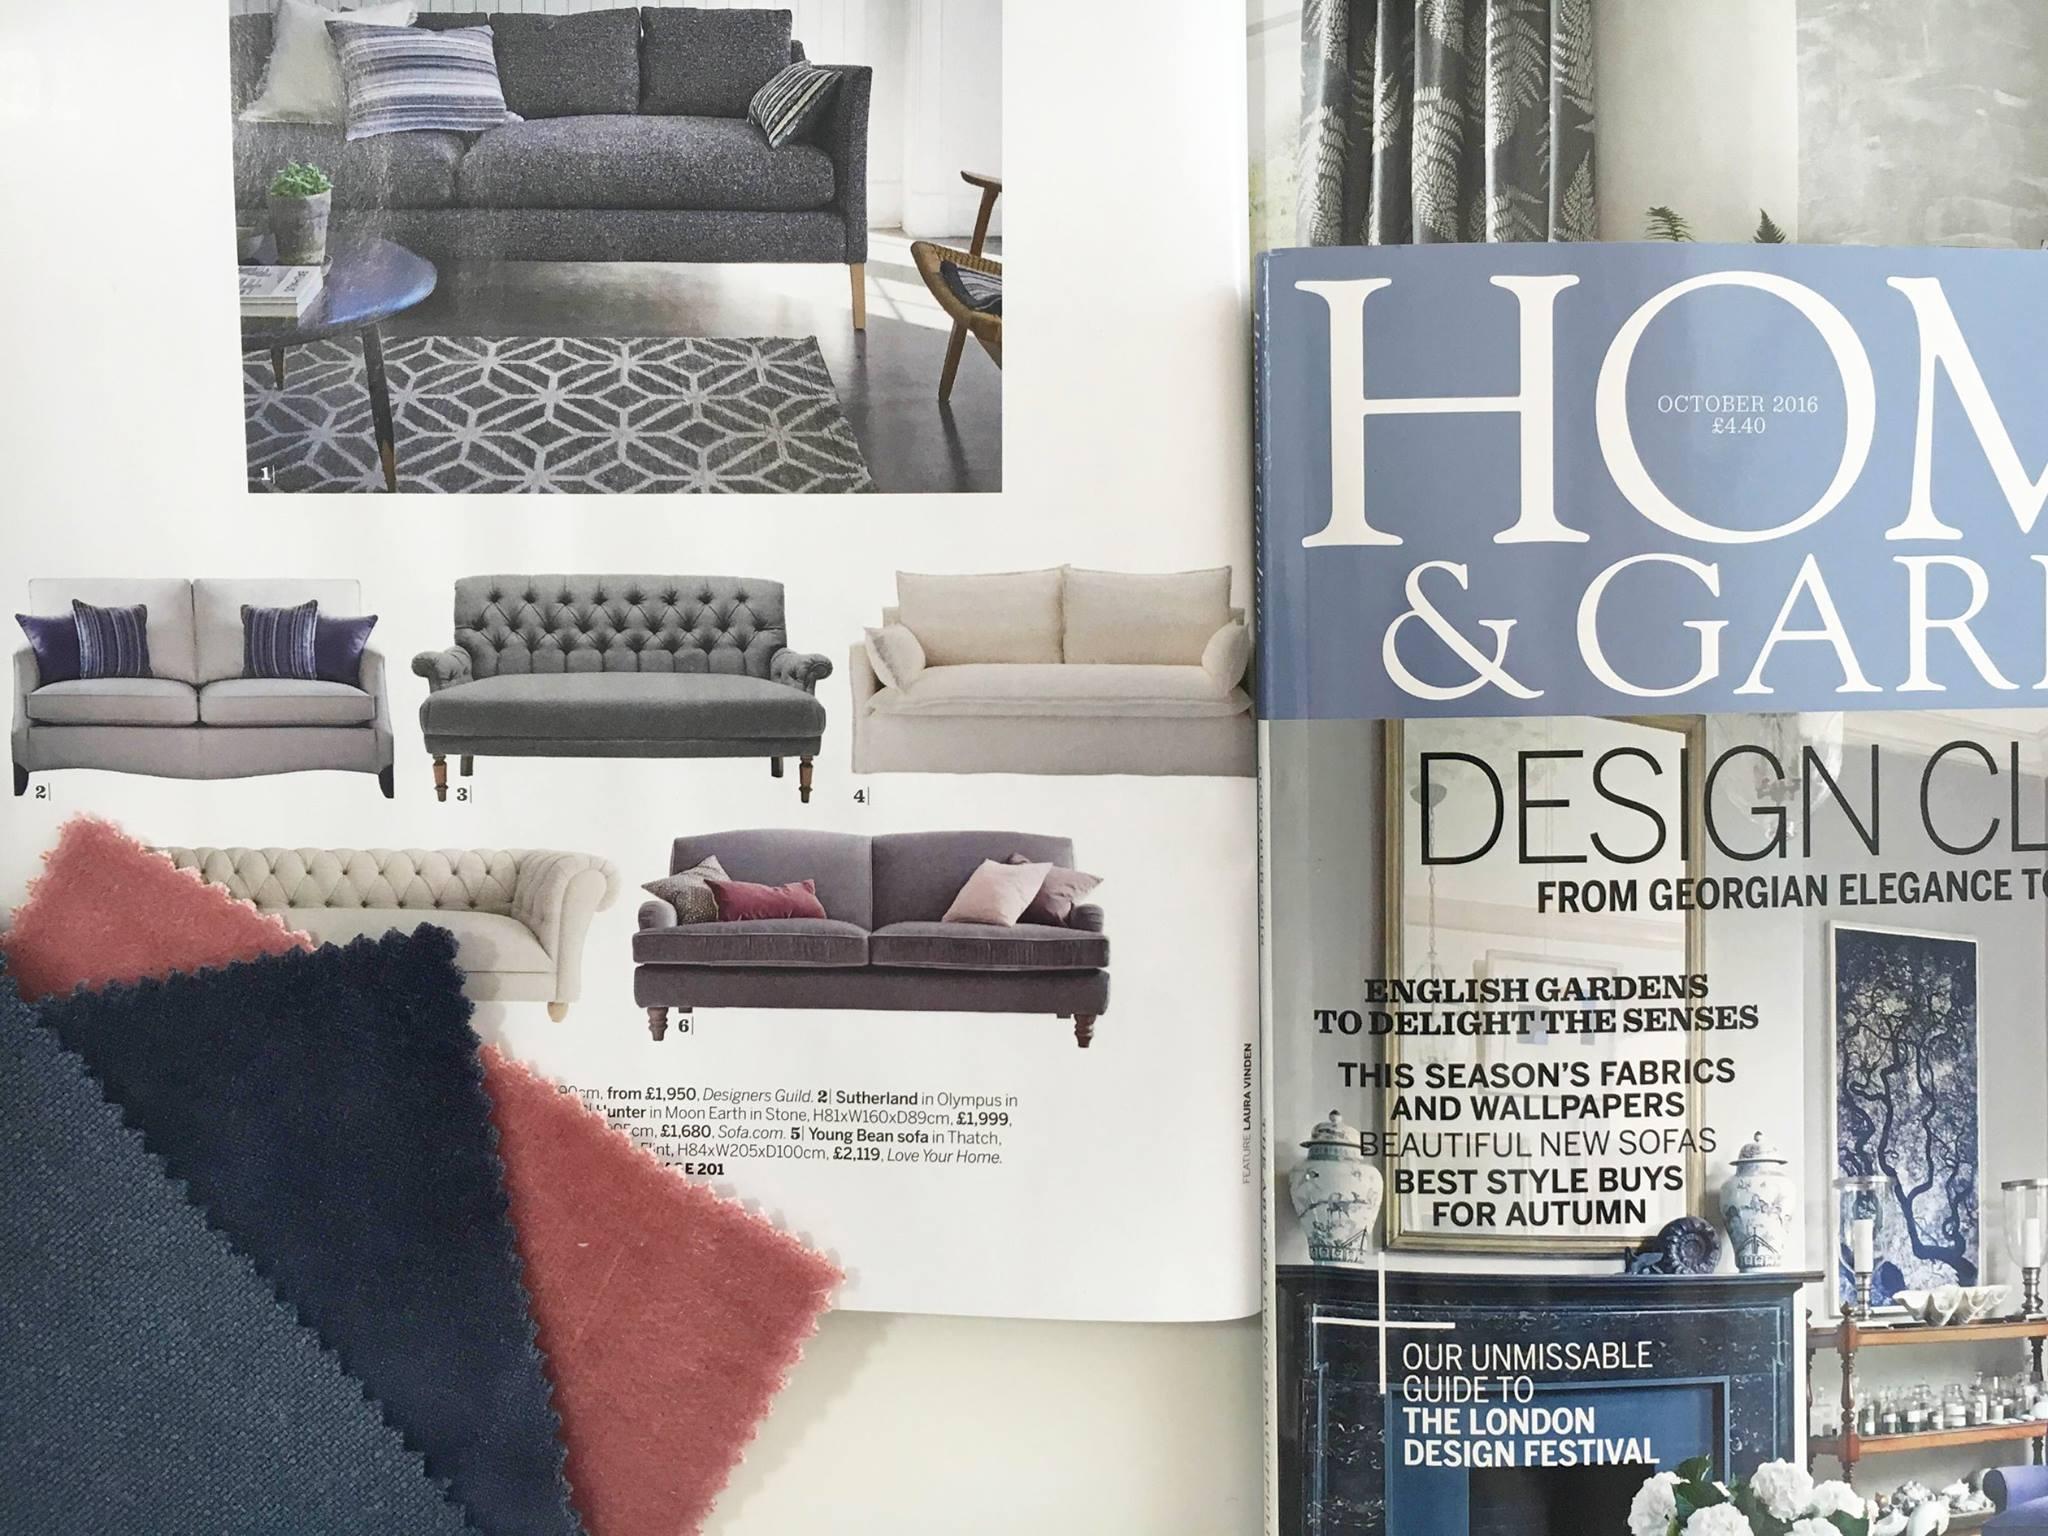 Eliza sofa in Homes&Gardens magazine